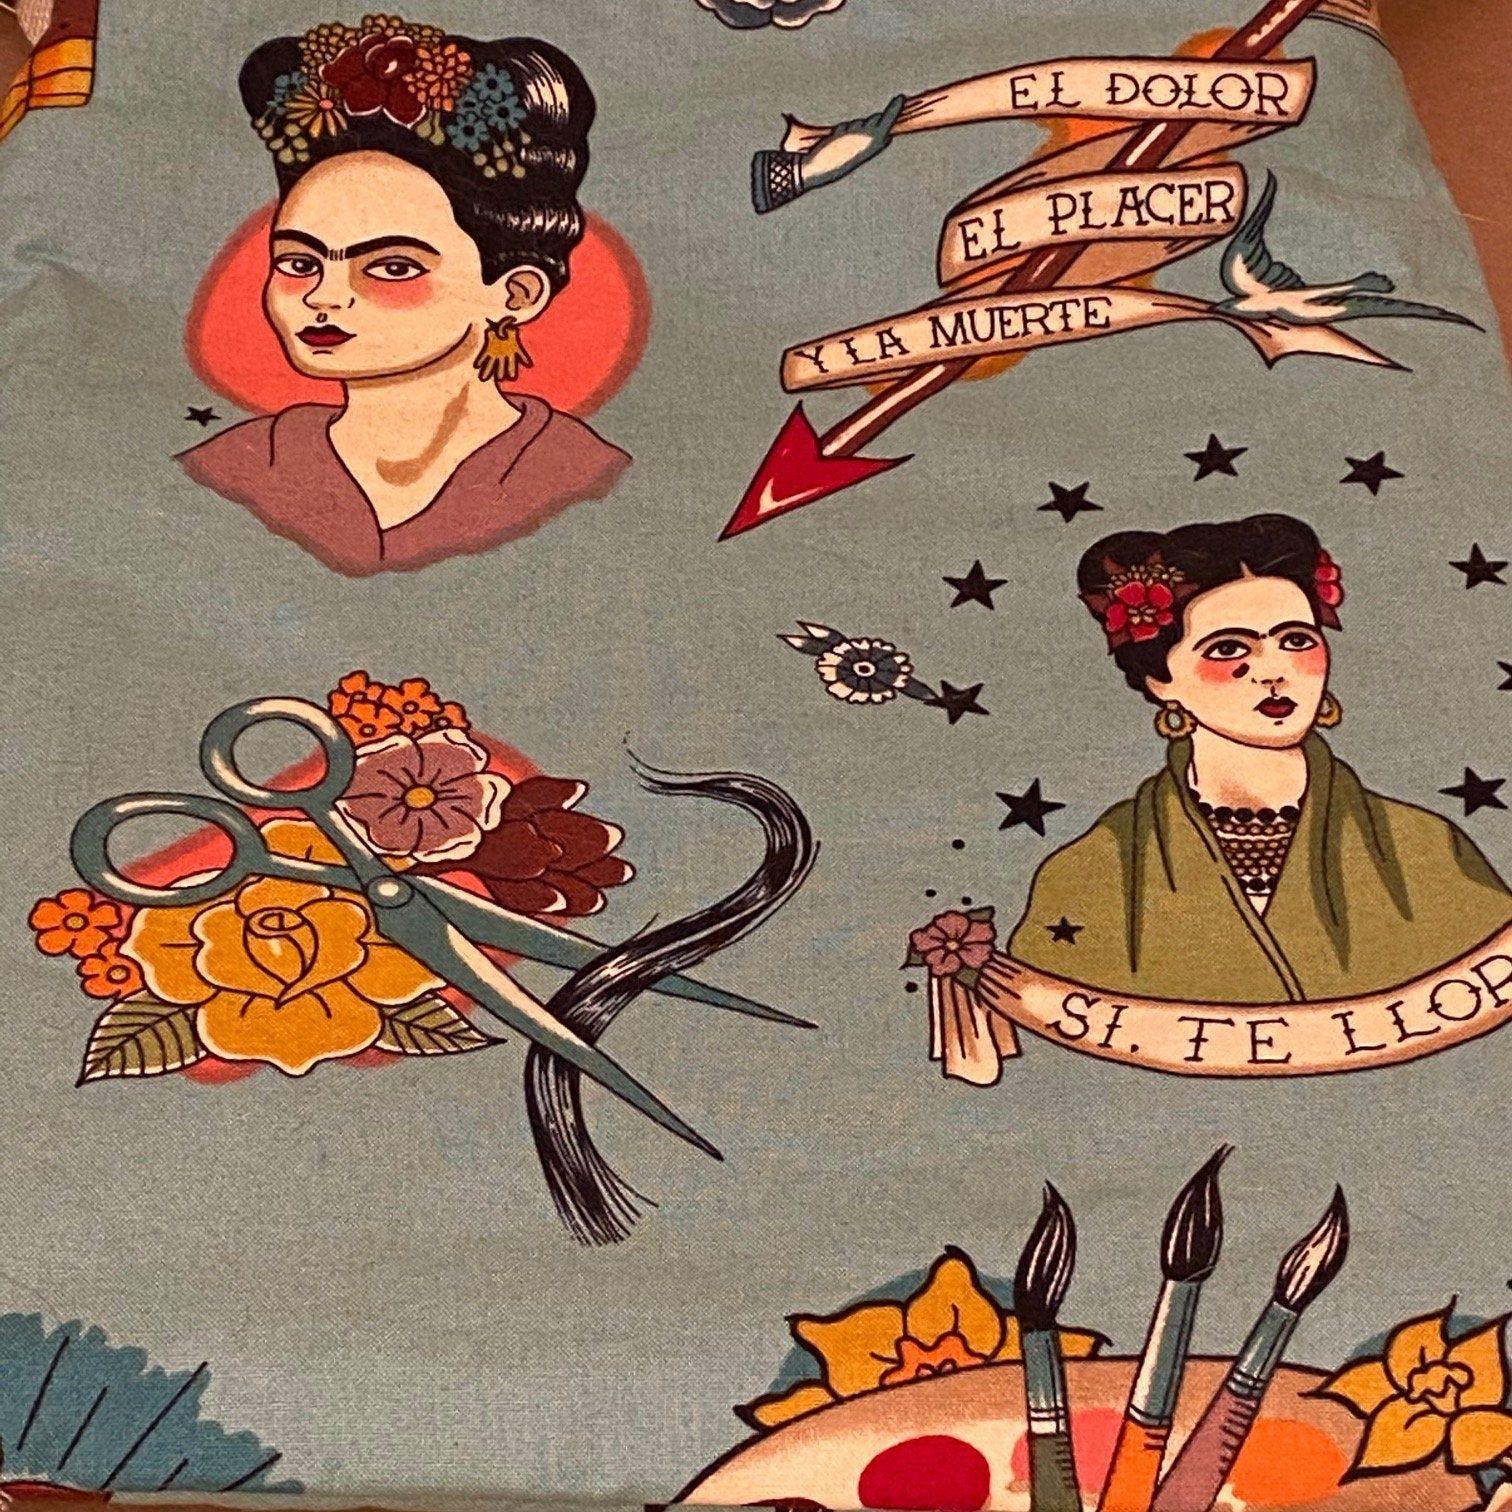 Crossbody Hipster Bag, Frida Kahlo Throwback, Famous MCM Mexican Artist Painter, Folk Art Style, Handmade Medium Soft Cotton Ladies Purse @thepeppysquid #lovefrida #Fridakahlo #classicartist #retrostyle #kahlo #folkartists #handmadebags #cottonbag #handcraftedbags #everydaybag #crossbodybag #crossbodybags #bagsandpurses #bagloverscommunity #handbagsonline #hipsterbag #hipsterstyle #handmadeonetsy #discoveretsy #etsymaker #lovehandmade #handcraftedgifts #etsymakers #etsyusa